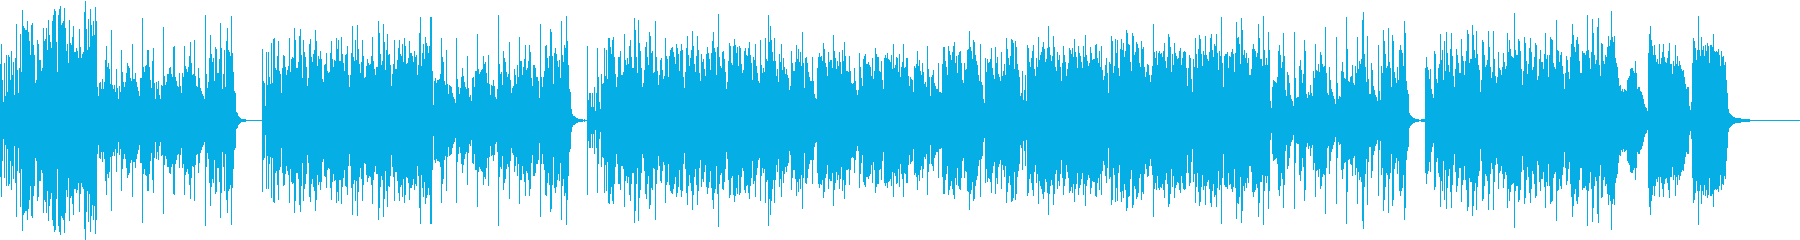 R&Bインストルメンタル。 Swi...の再生済みの波形